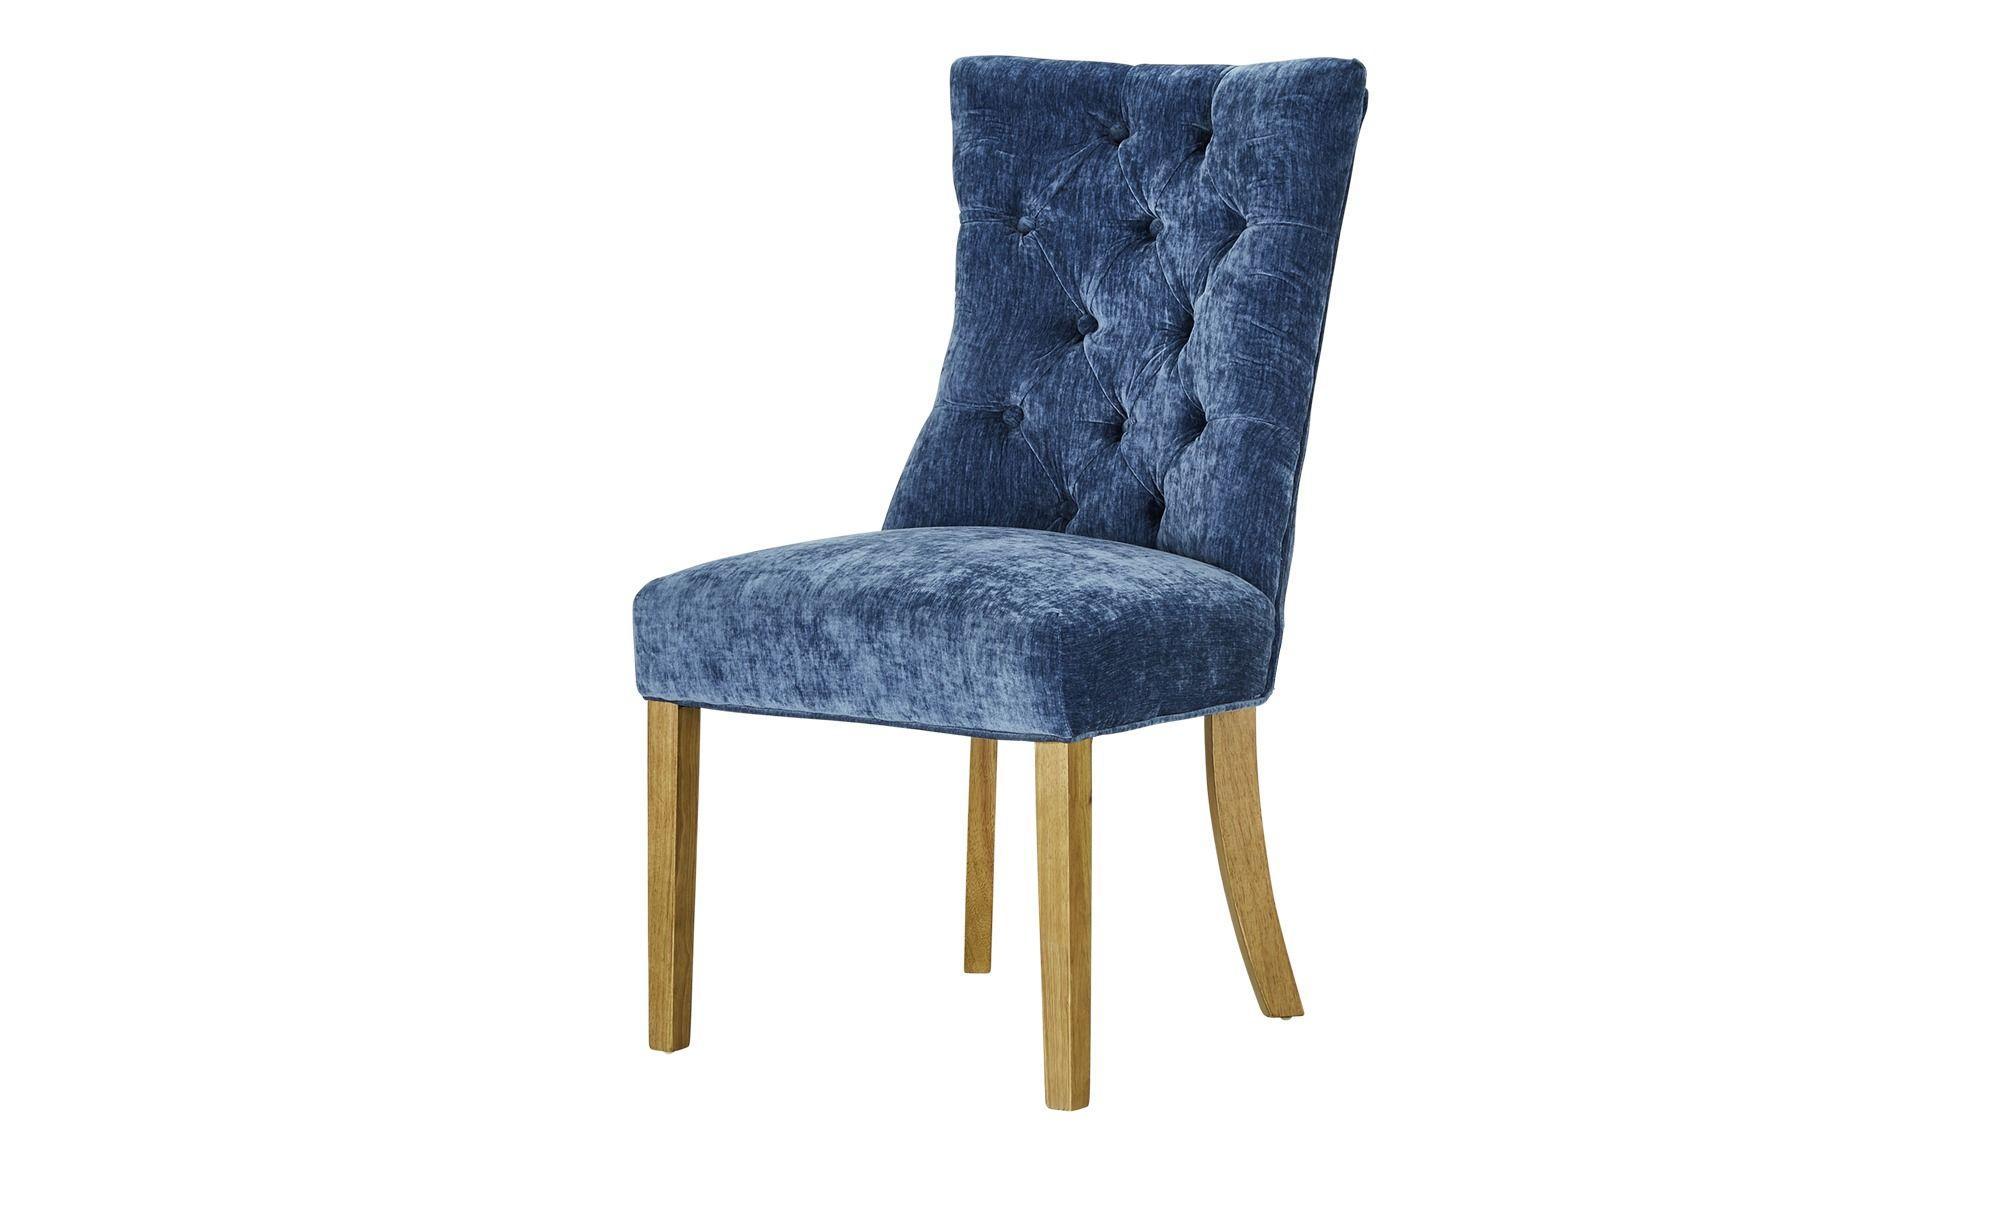 Stuhl Hennig ¦ blau ¦ Maße (cm): B: 56 H: 99 T: 66 Stühle ...